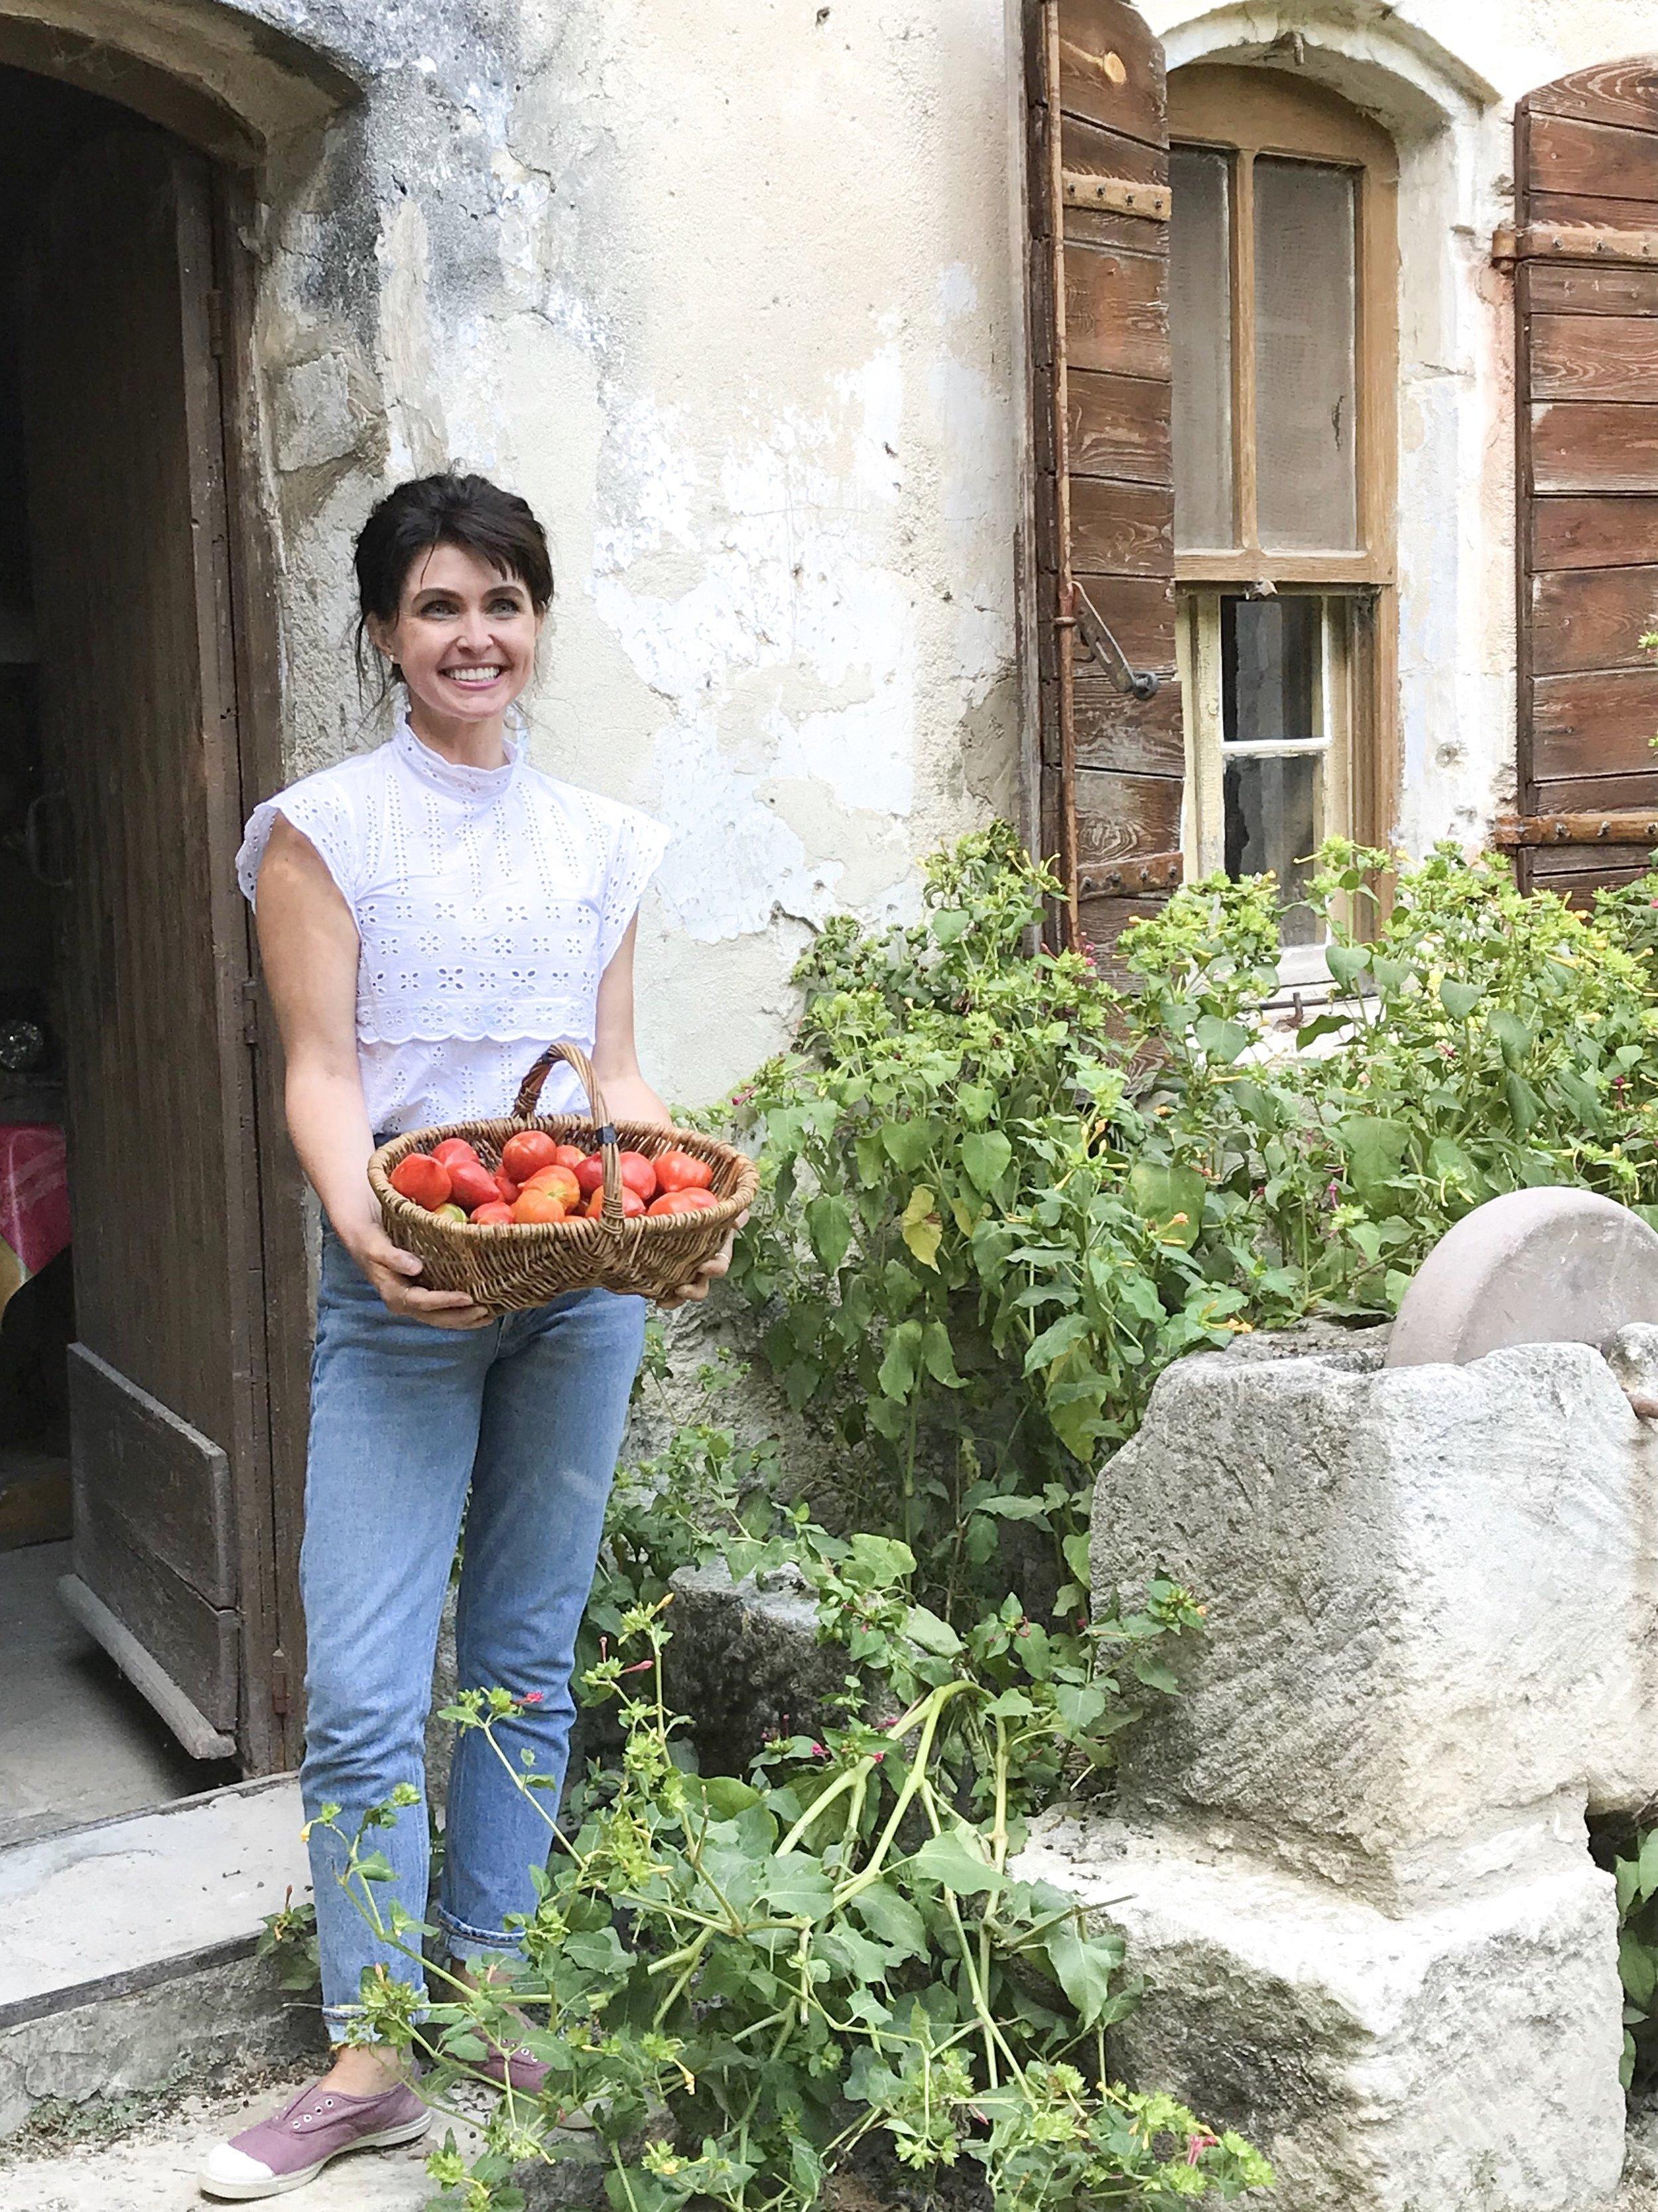 French Tomatoes - from Lolo's garden, Mas de la Pyramide